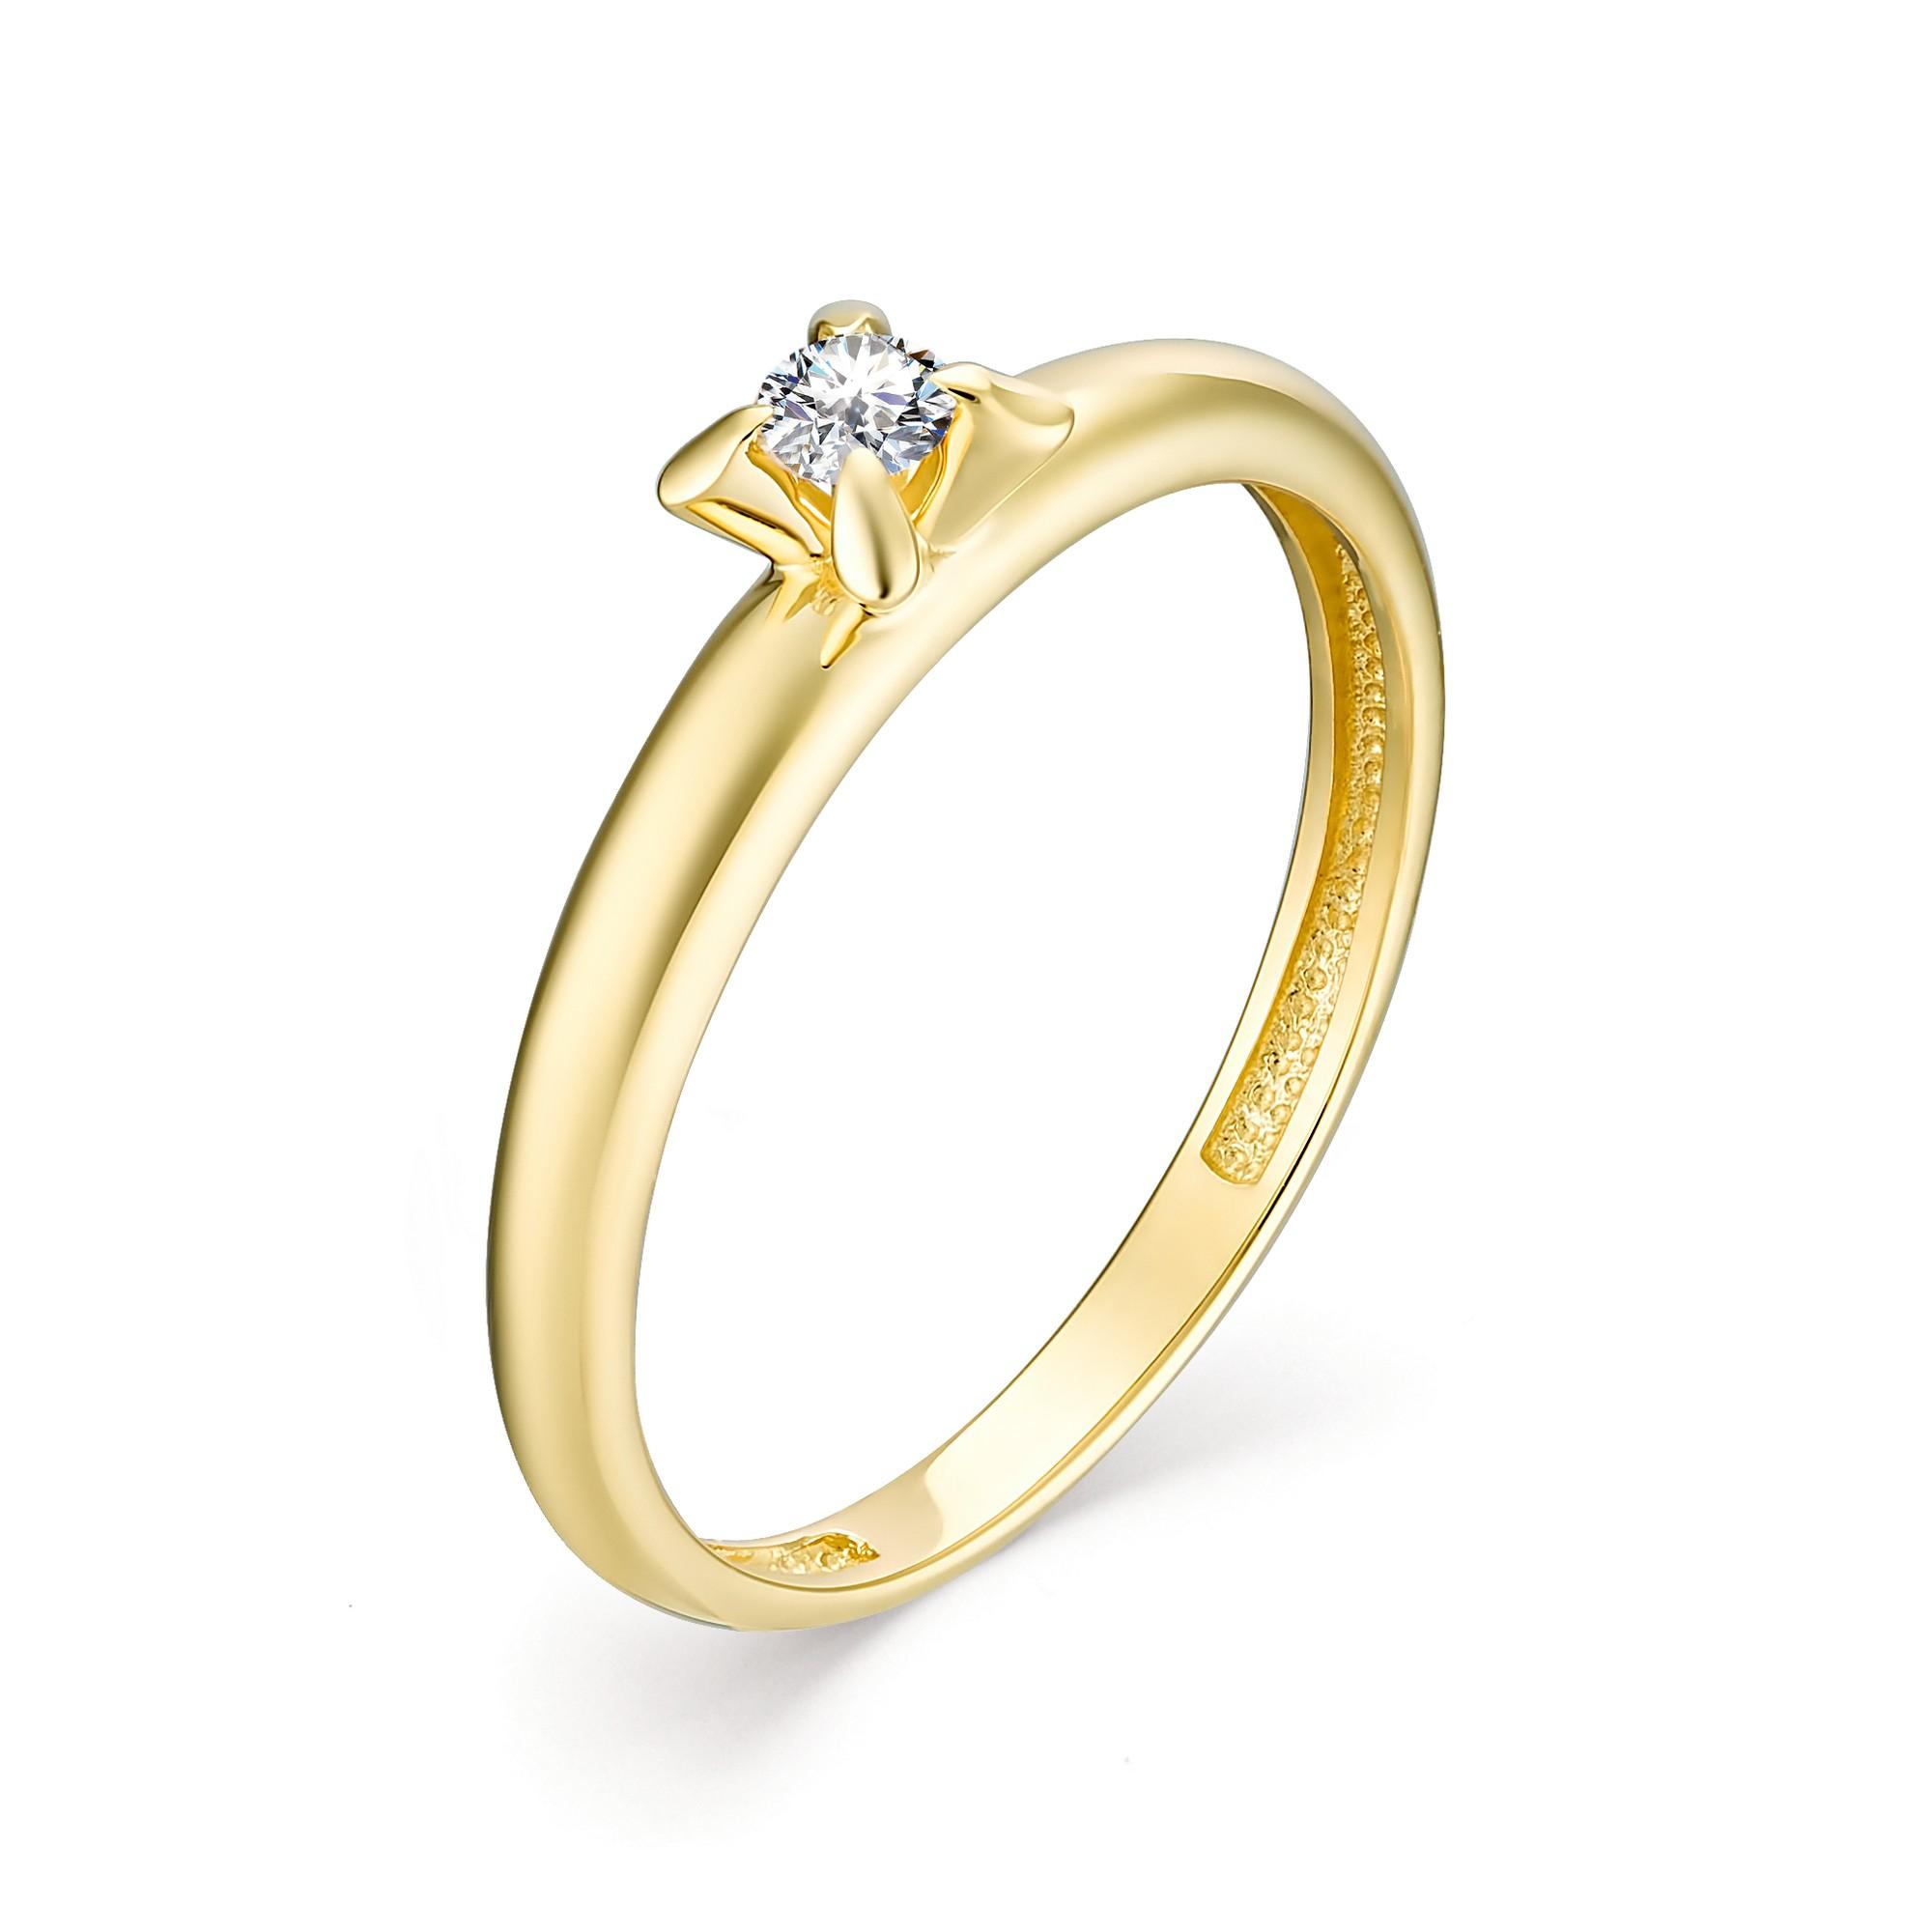 картинка кольцо 13019-300 1 бриллиант круг 57 0,088 10-15 4/6а 13019-300